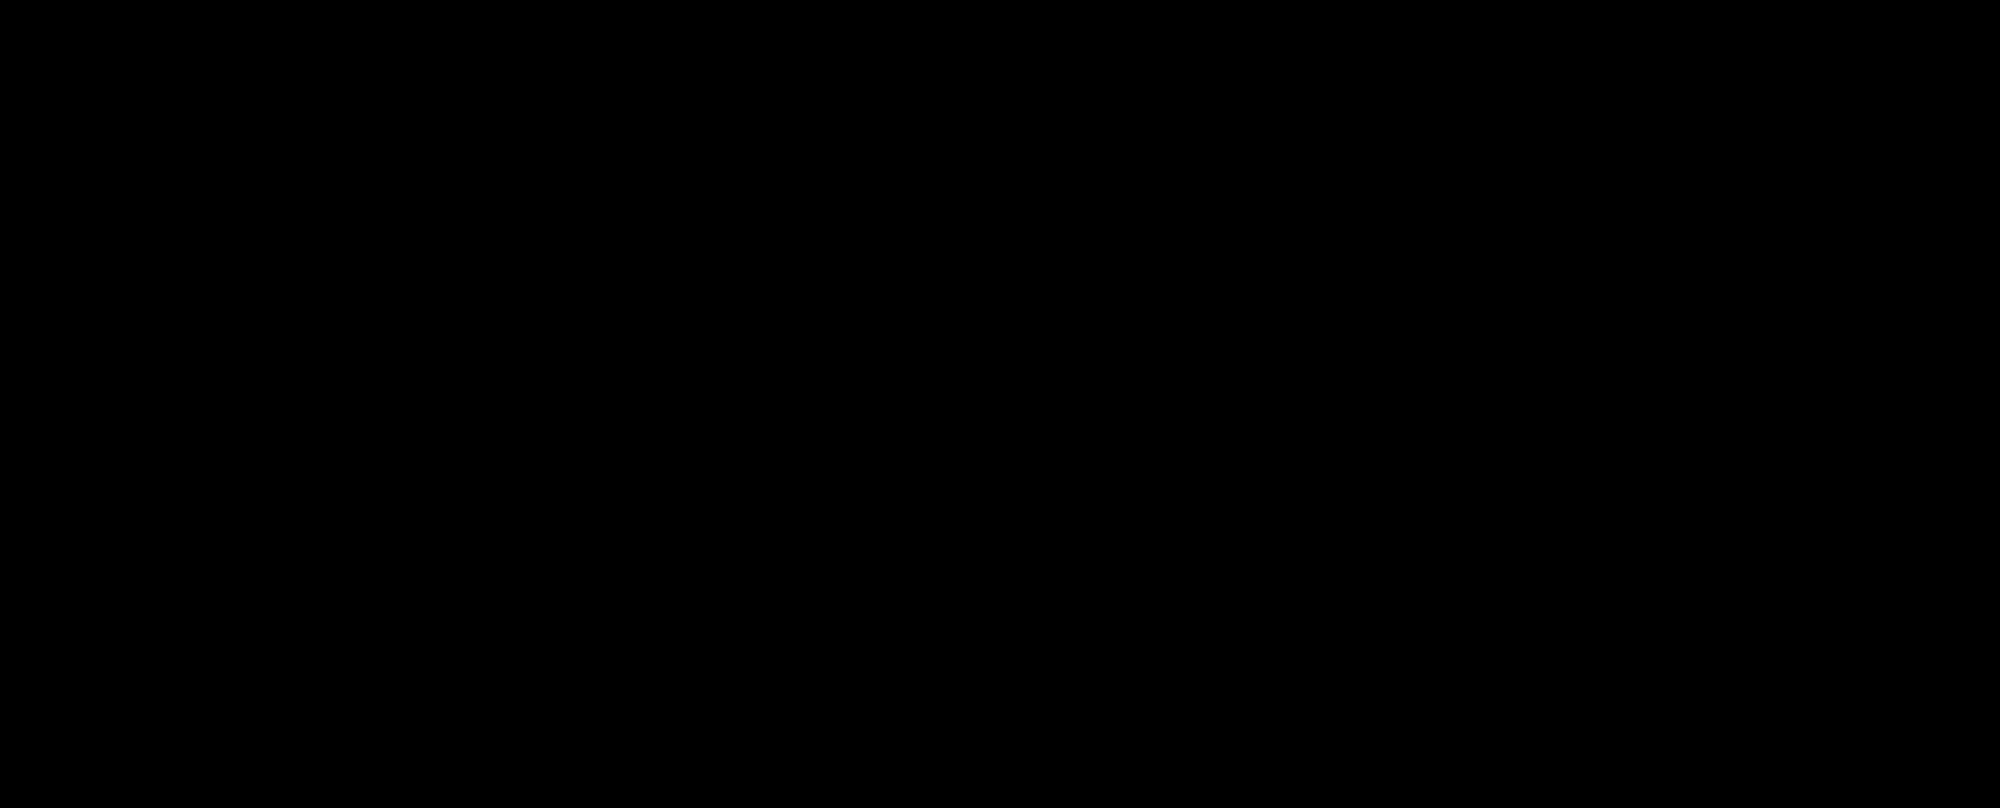 Inspired by laura logo juodas kiauras